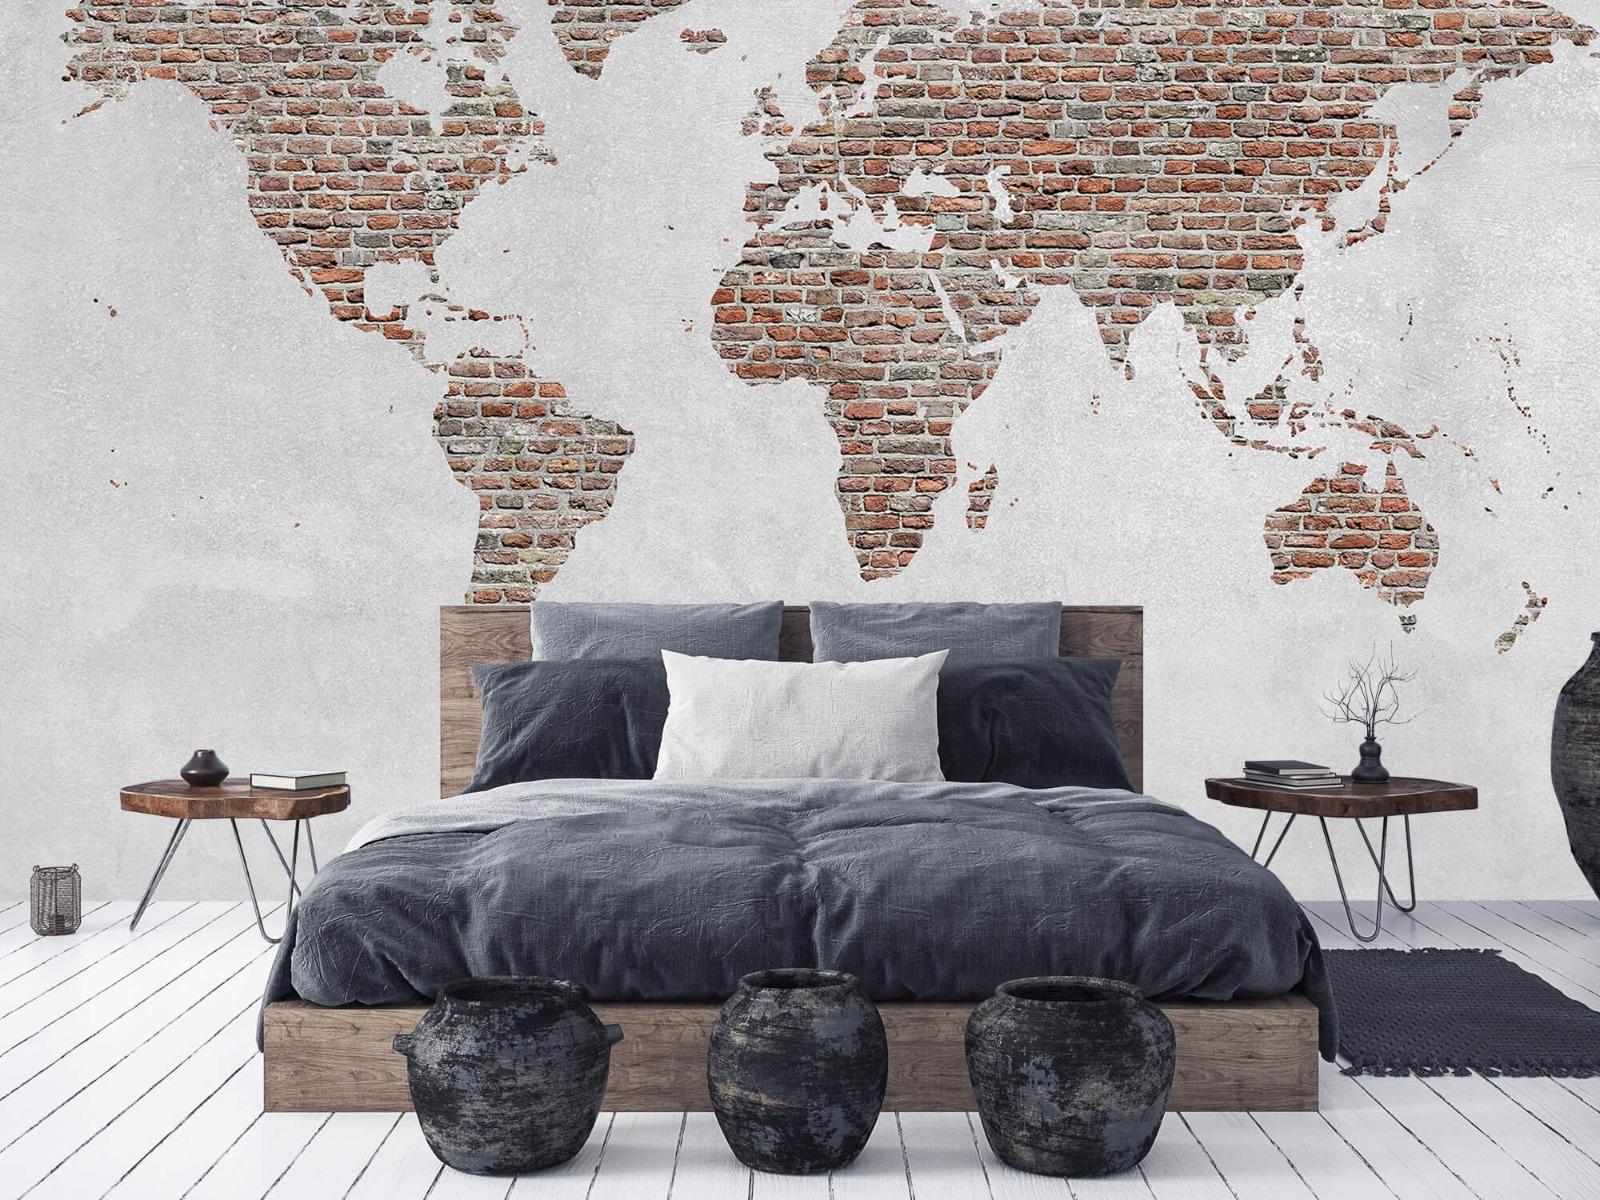 Steen behang - Wereldkaart stenen - Slaapkamer 5